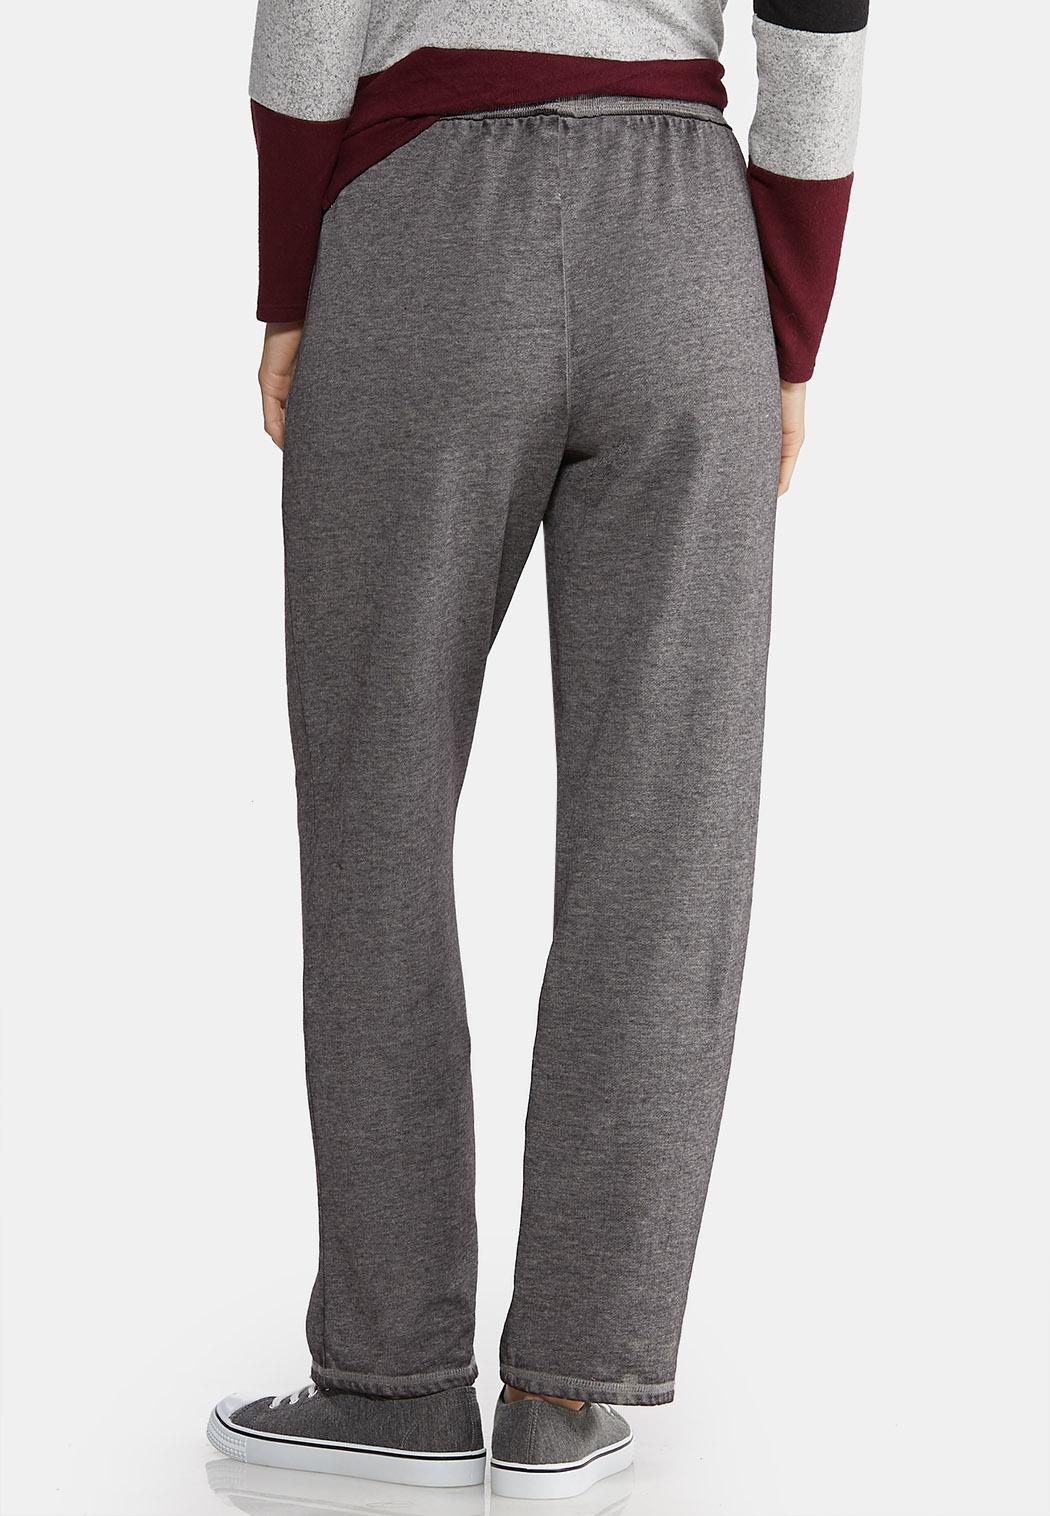 Fleece Lined Pants (Item #44006165)